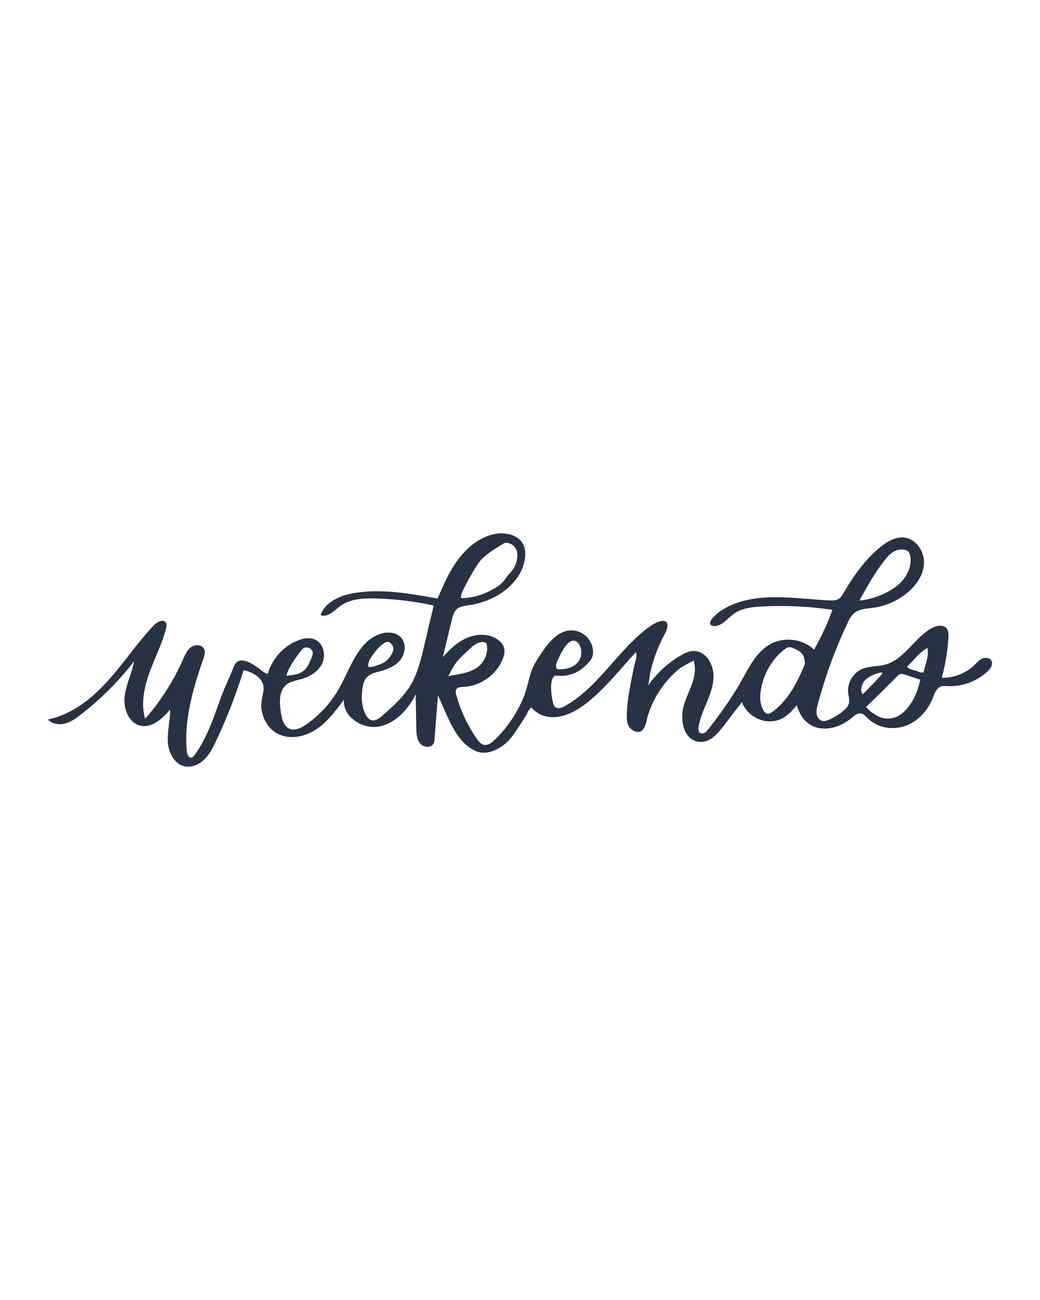 """weekends"" calligraphy"